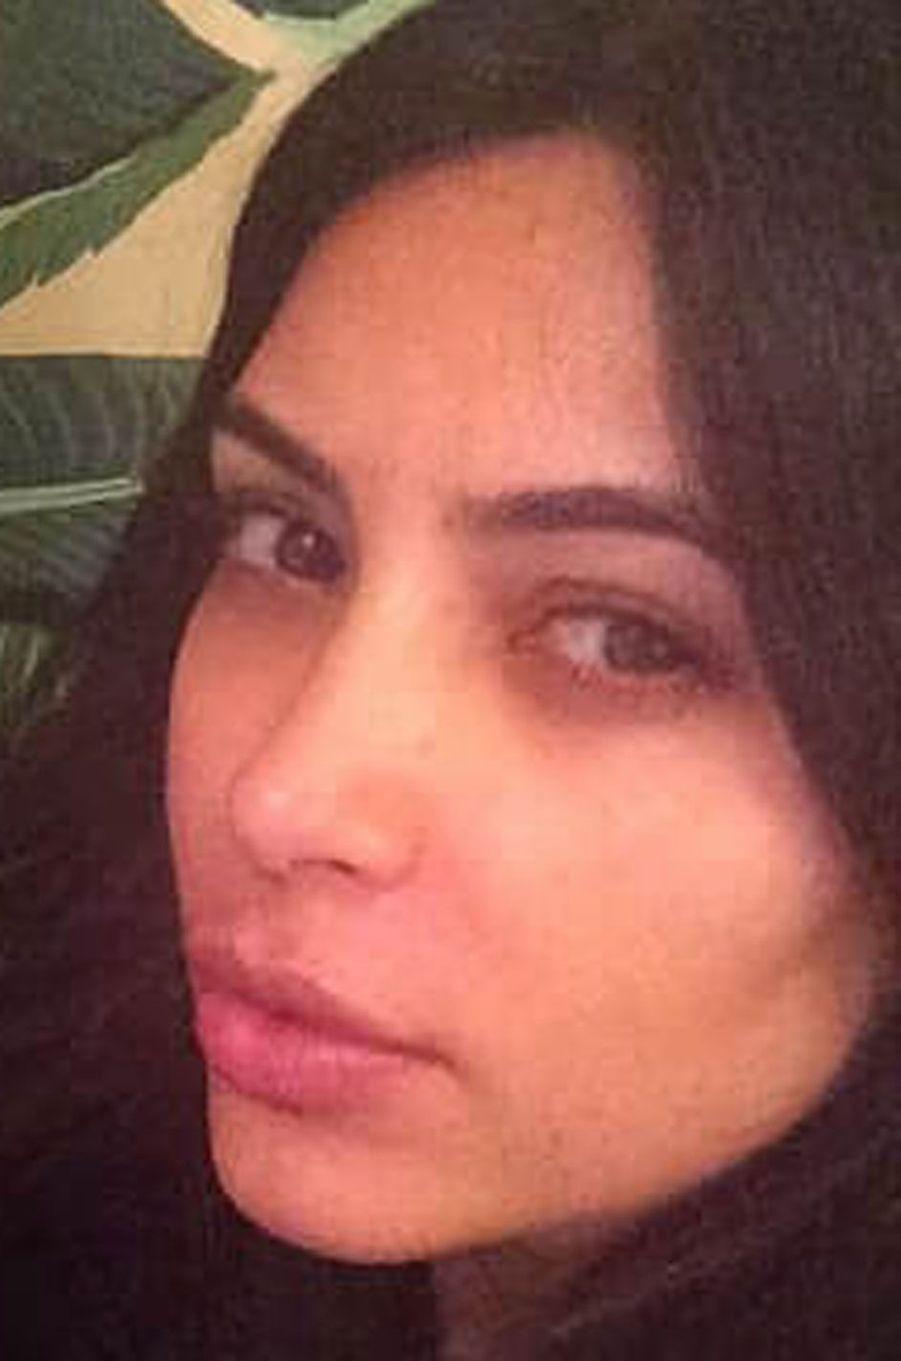 Kim Kardashian belle au naturel.